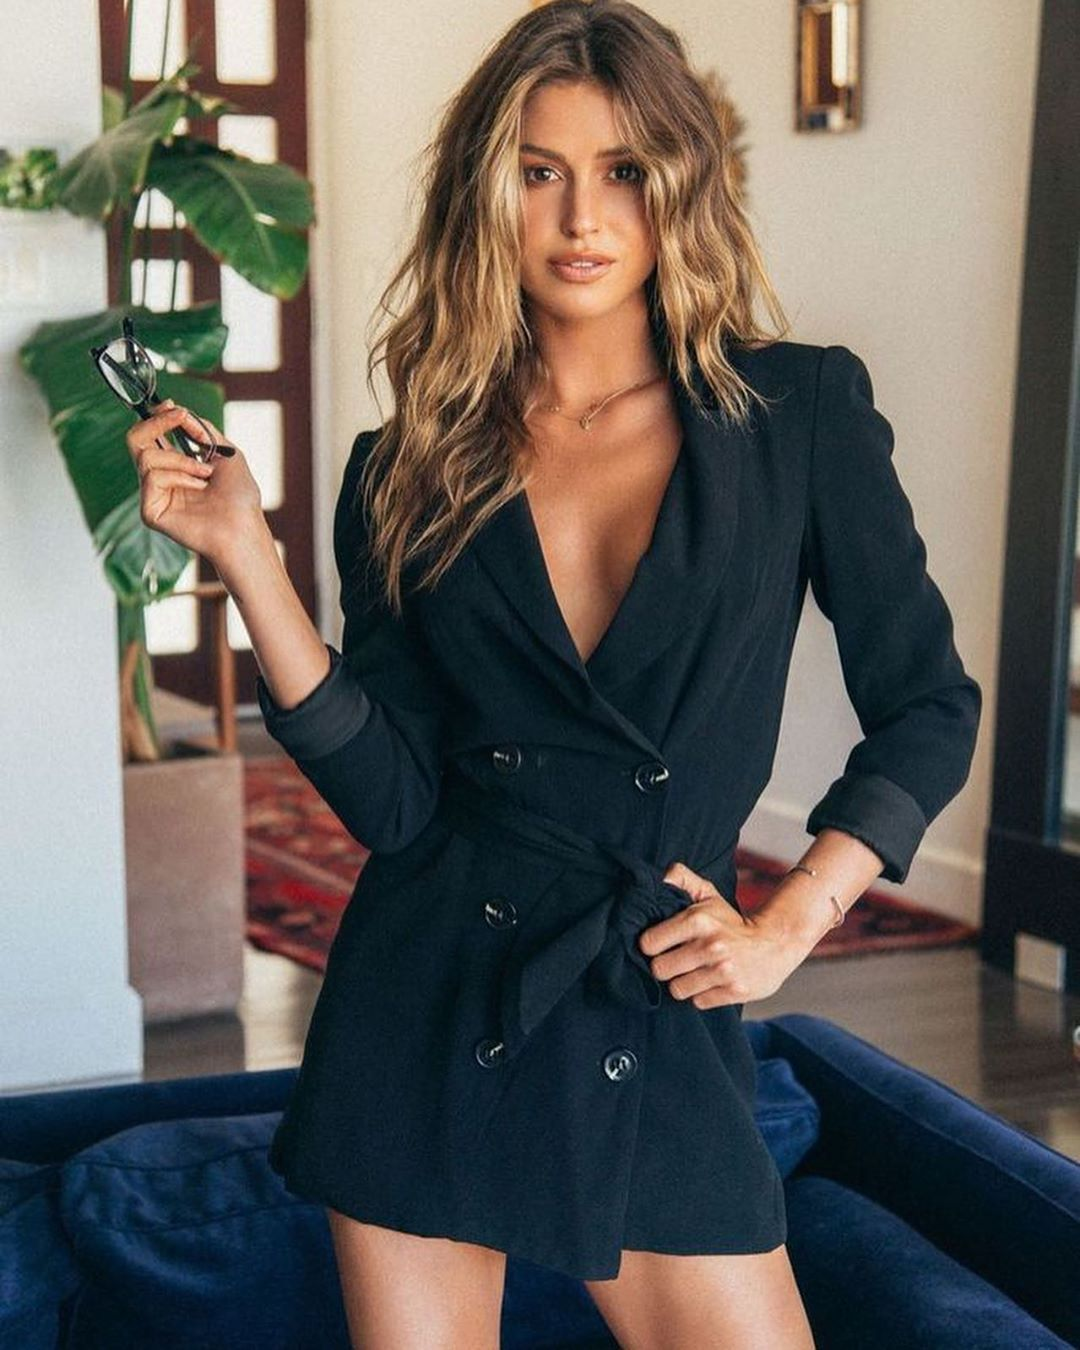 Gigi Paris On Instagram Ready For Business Codymcgibbon X 4yunamin In 2021 Classy Women Fashion Shirt Dress